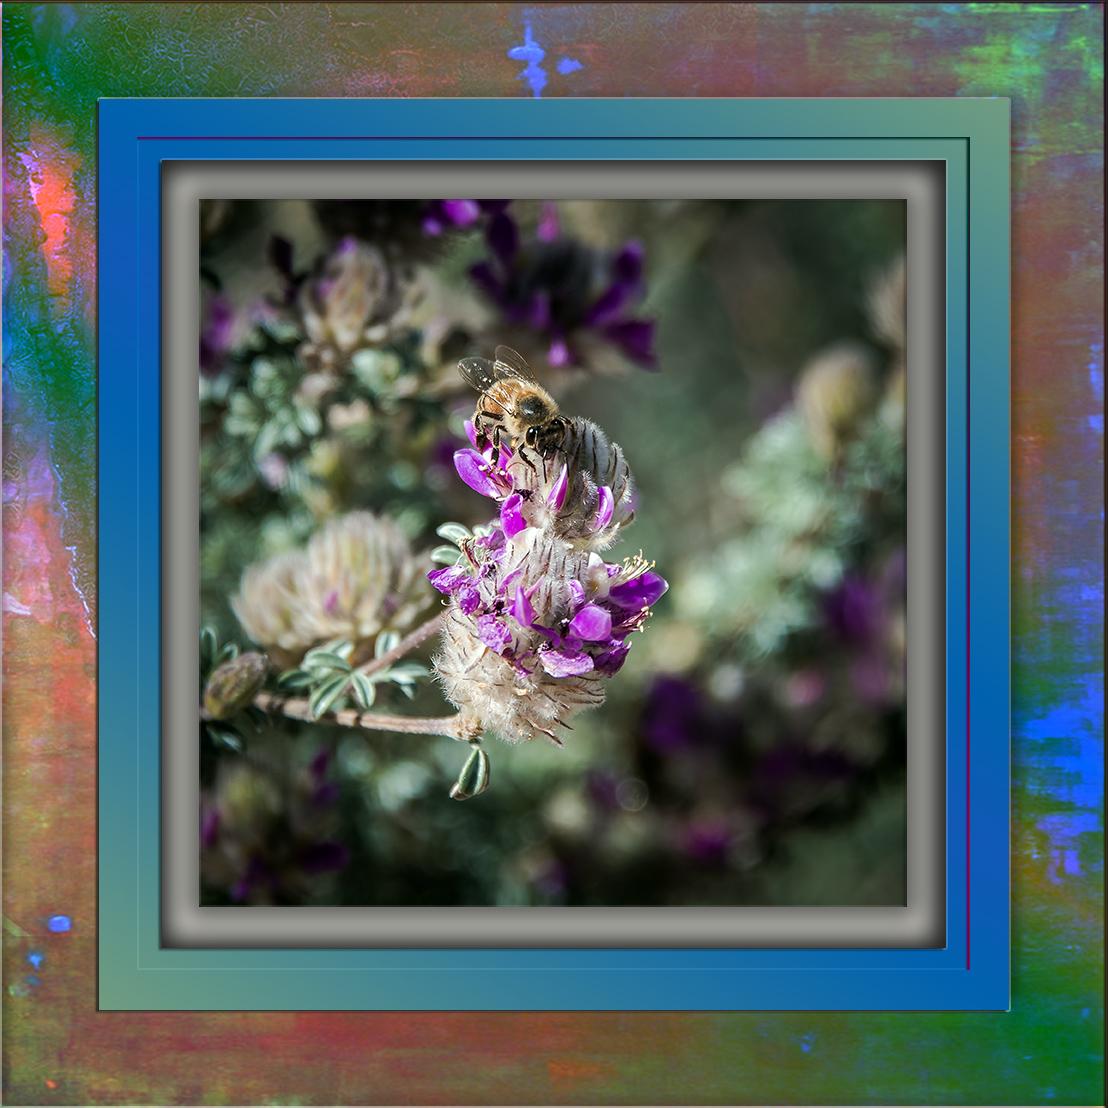 Bee on an Indigo Blossom-3428 blog.jpg